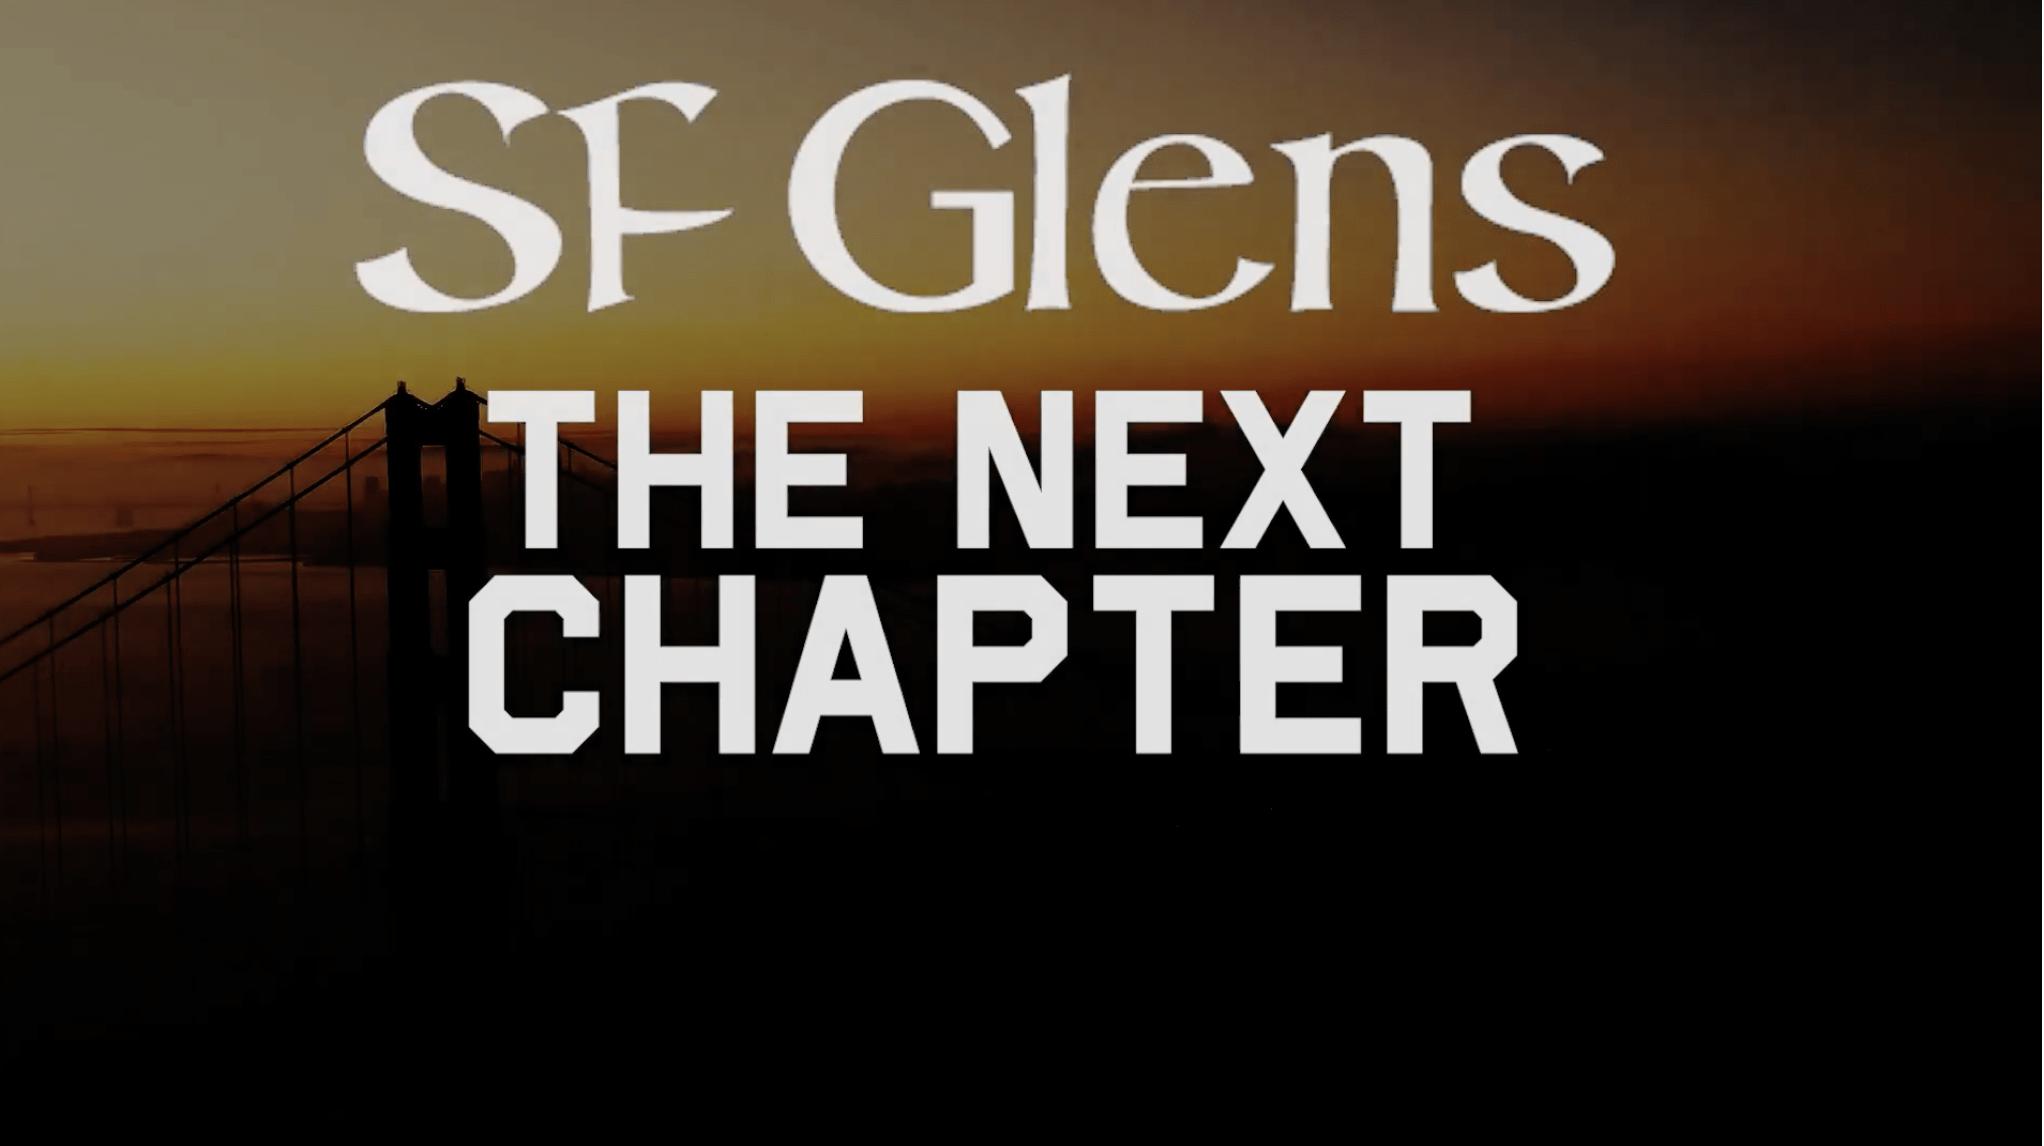 San Francisco Glens SC Celebrate 60th Anniversary with Big Announcement